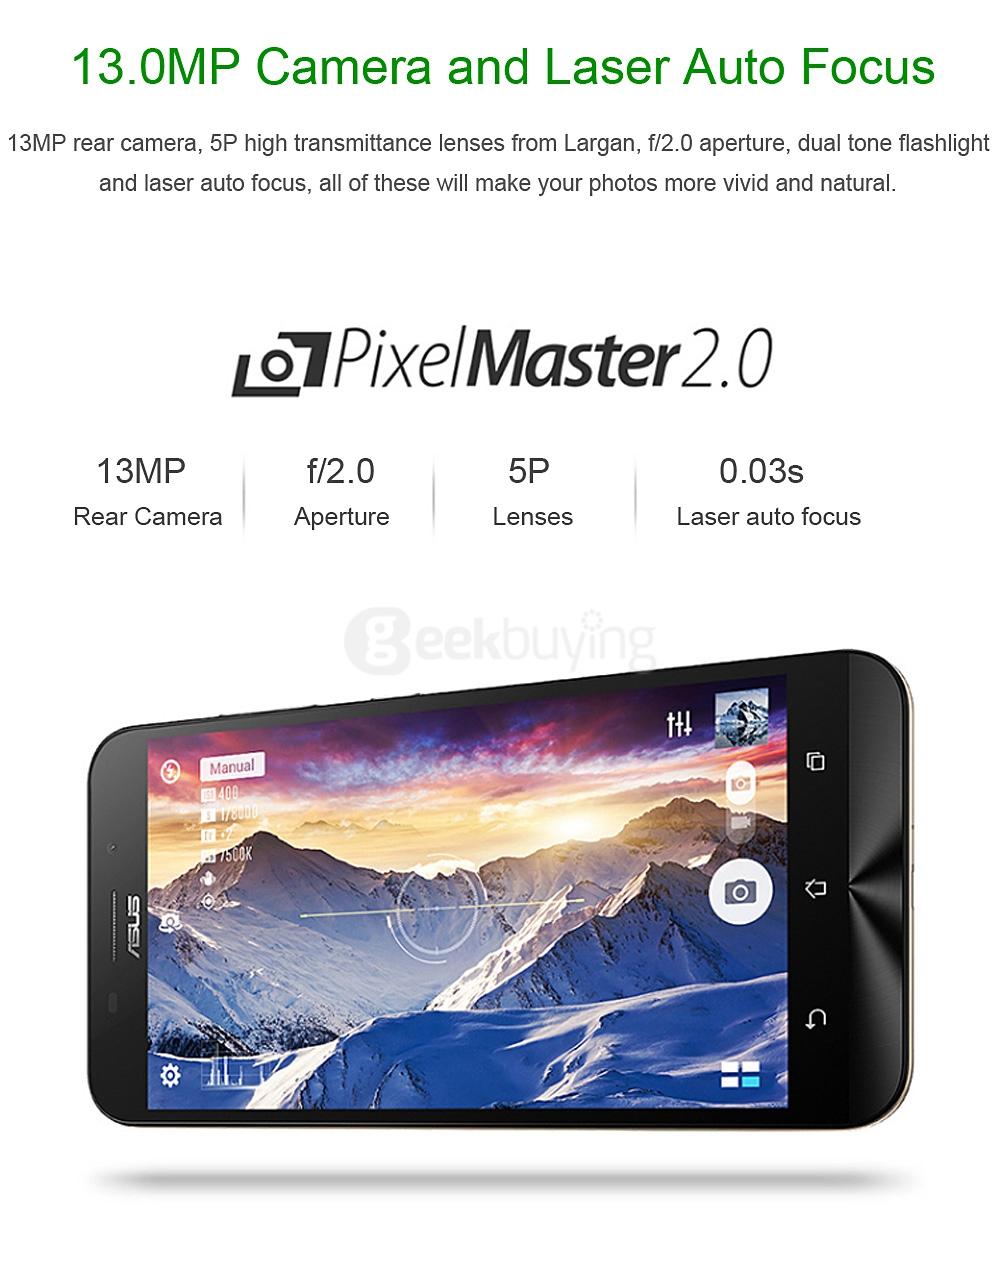 ASUS Zenfone Max , Kamera Sony, Laser Autofocus, Test Antutu, DHL Extress China Deutschland Tage